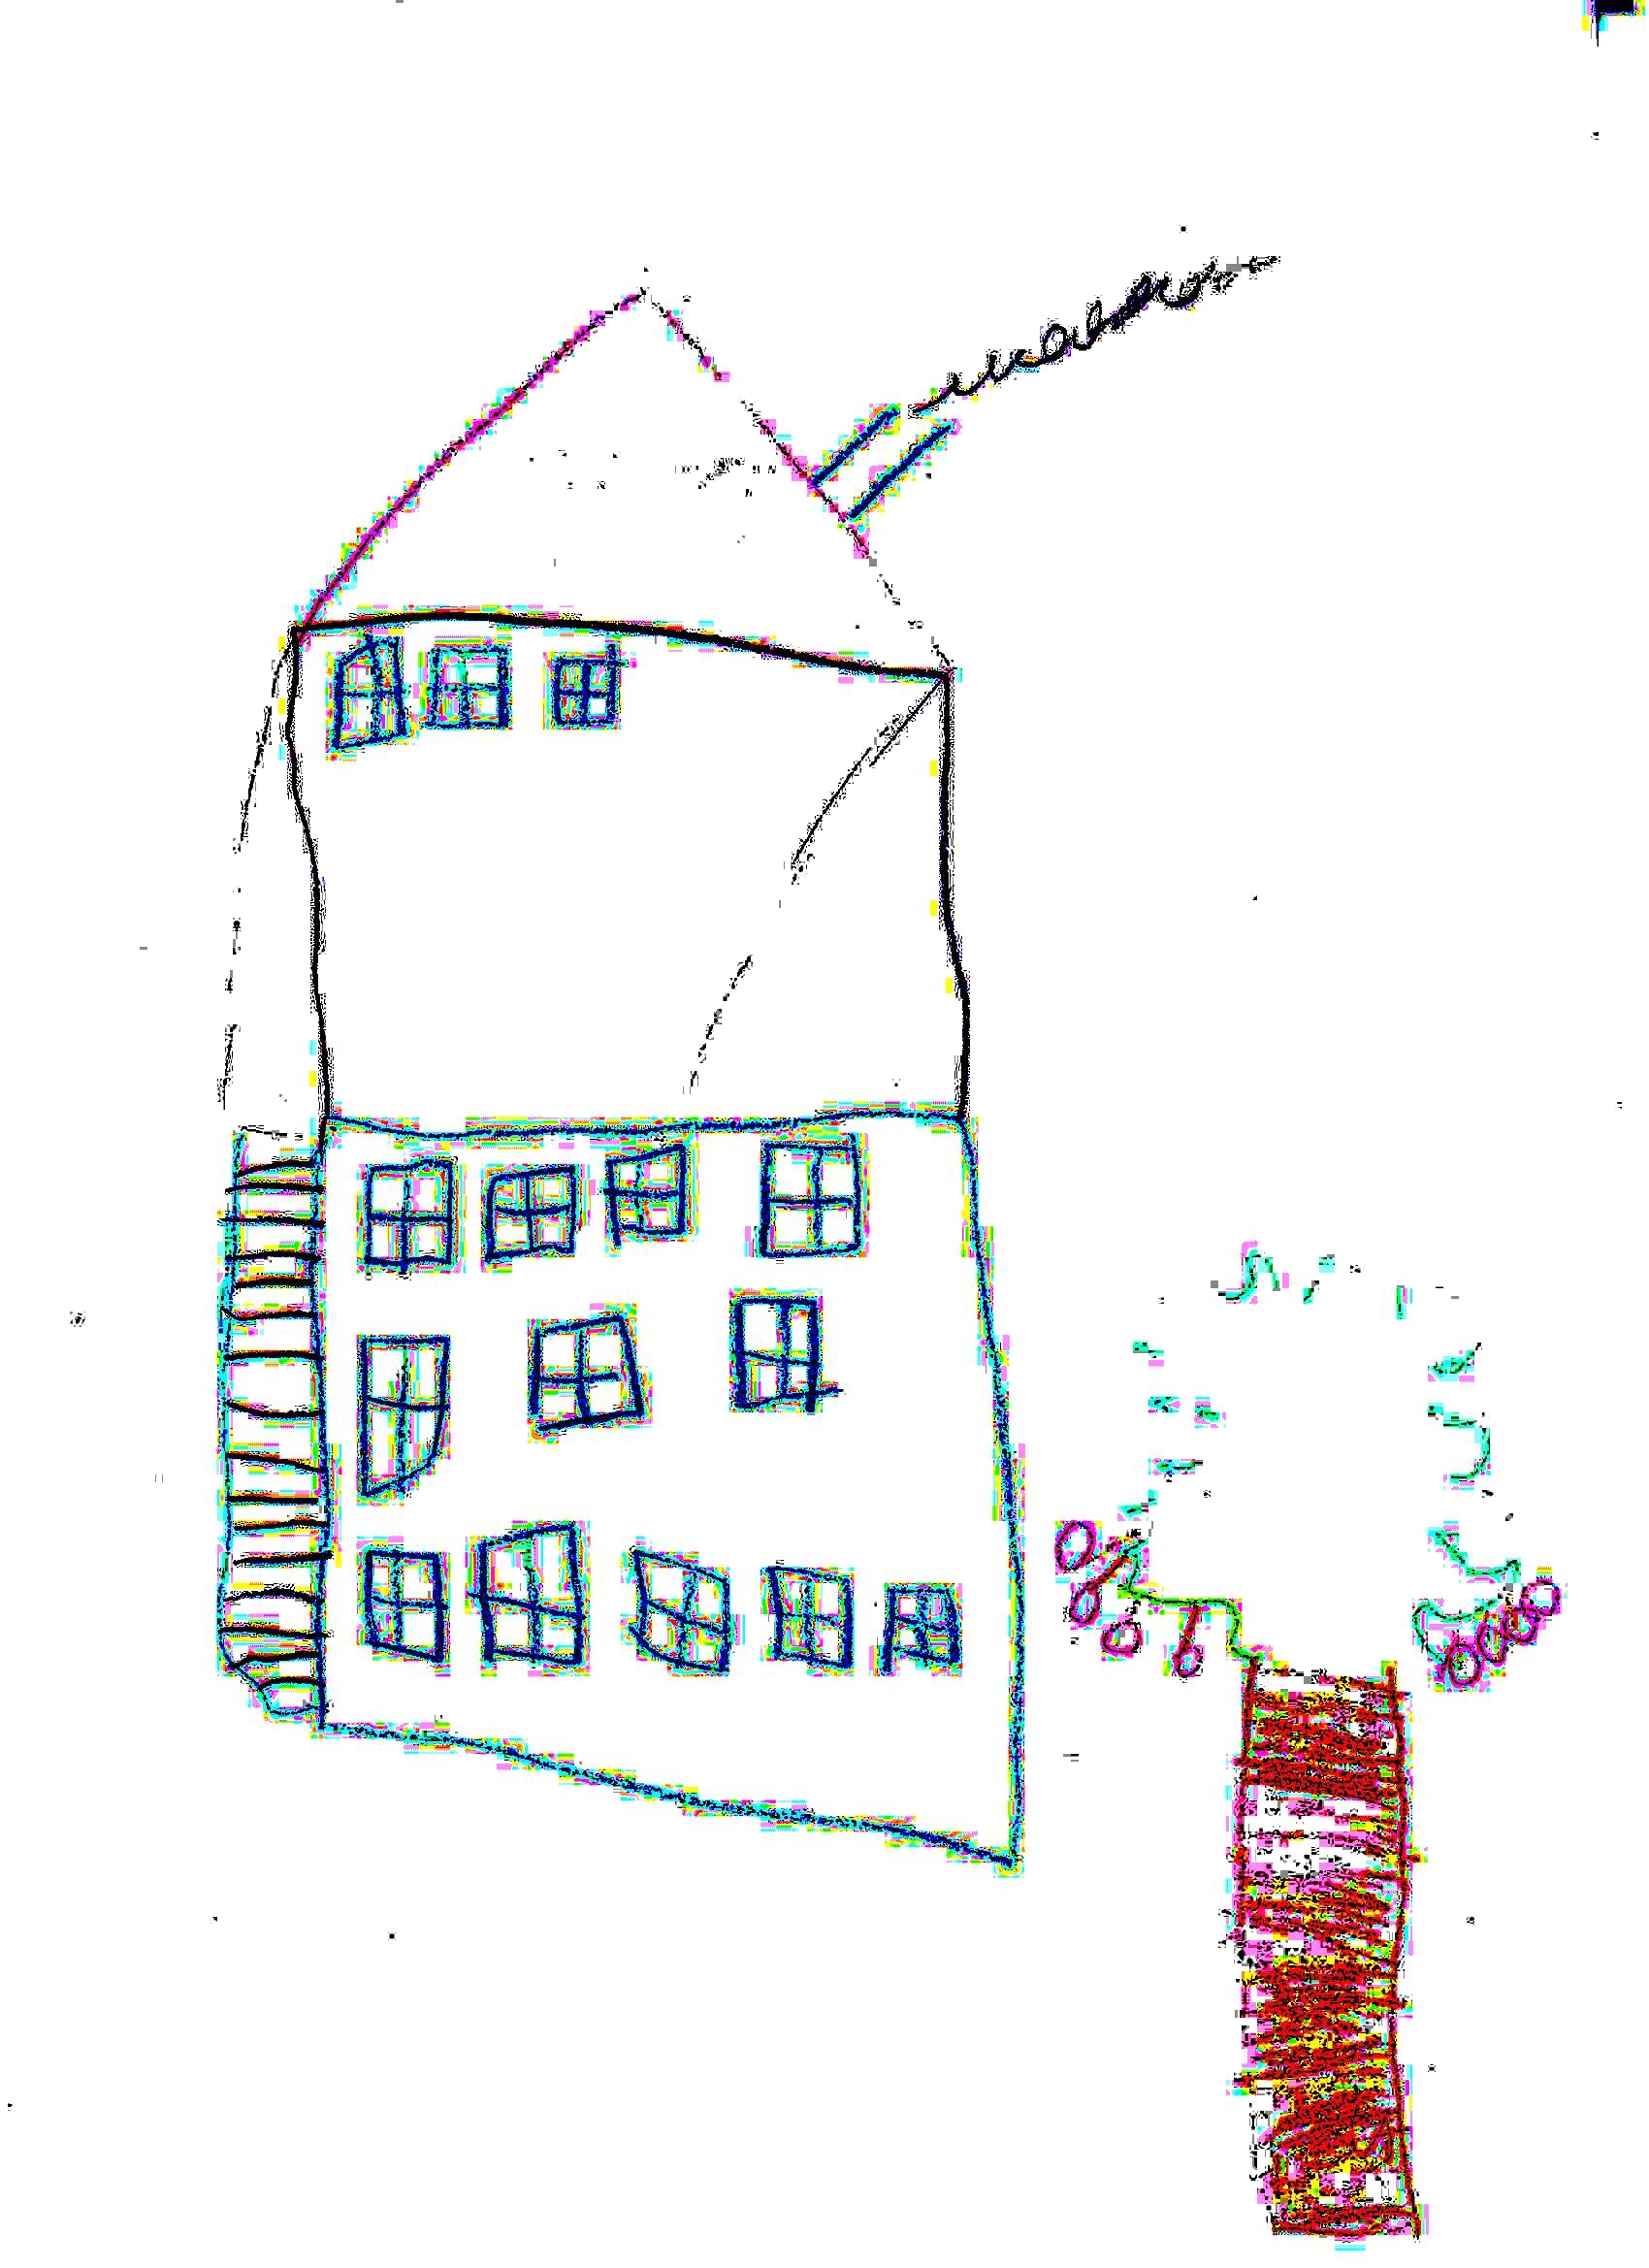 Kákánecz Makszim rajza